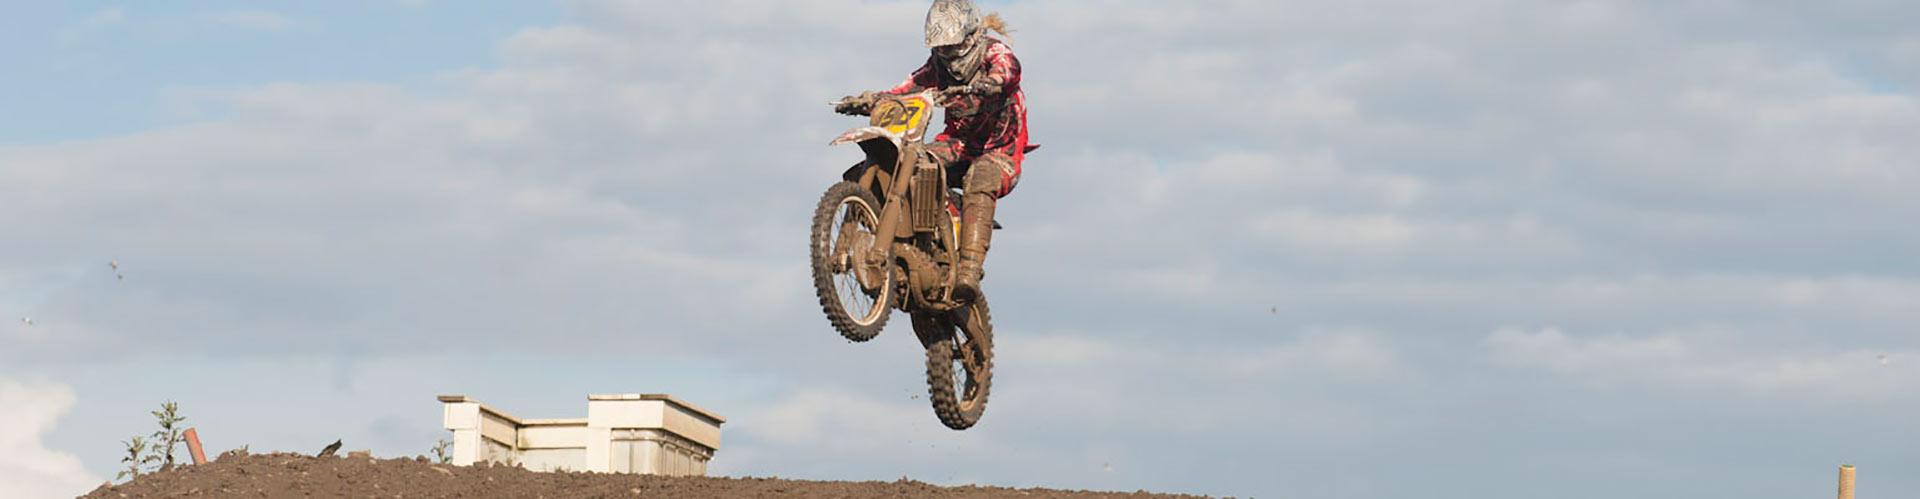 Panoramabild motorcross